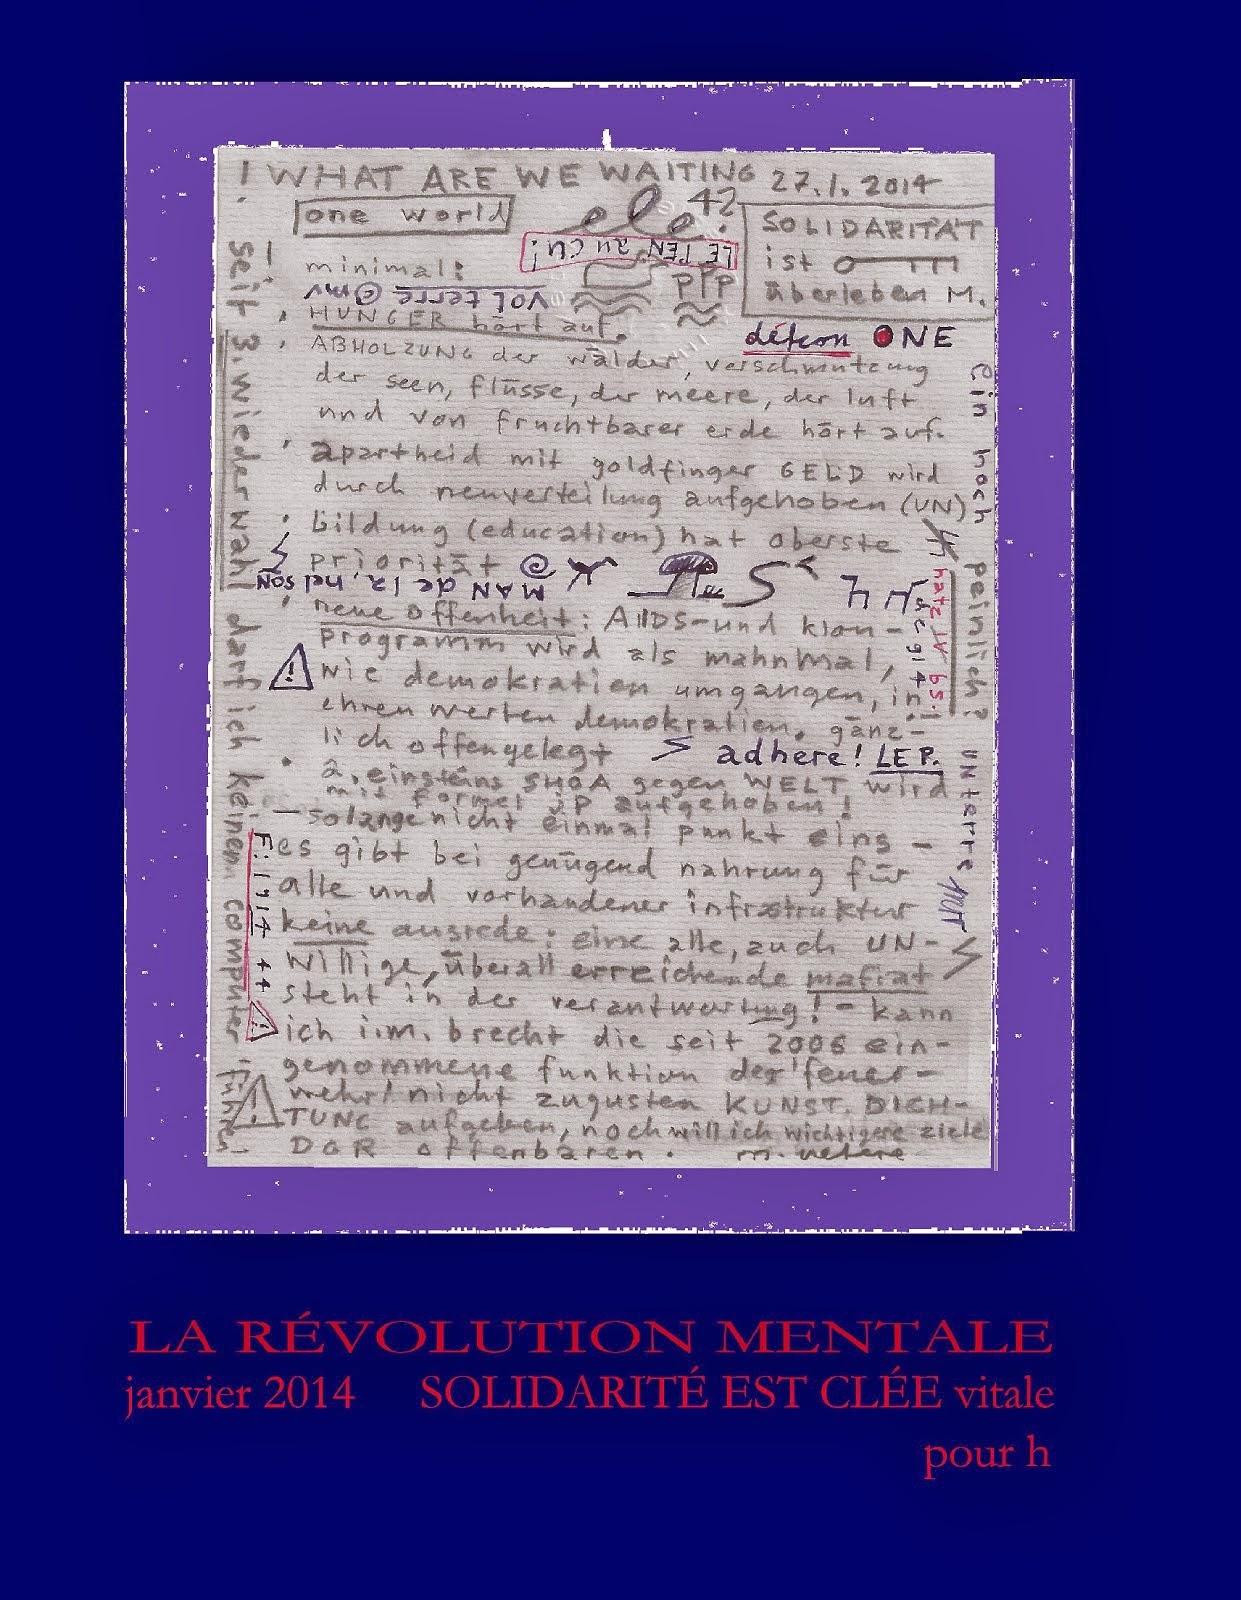 THE HOPE CYCLE 4 human politics - DIE GEISTIGE REVOLUTION TMR LRM DGR solidarité